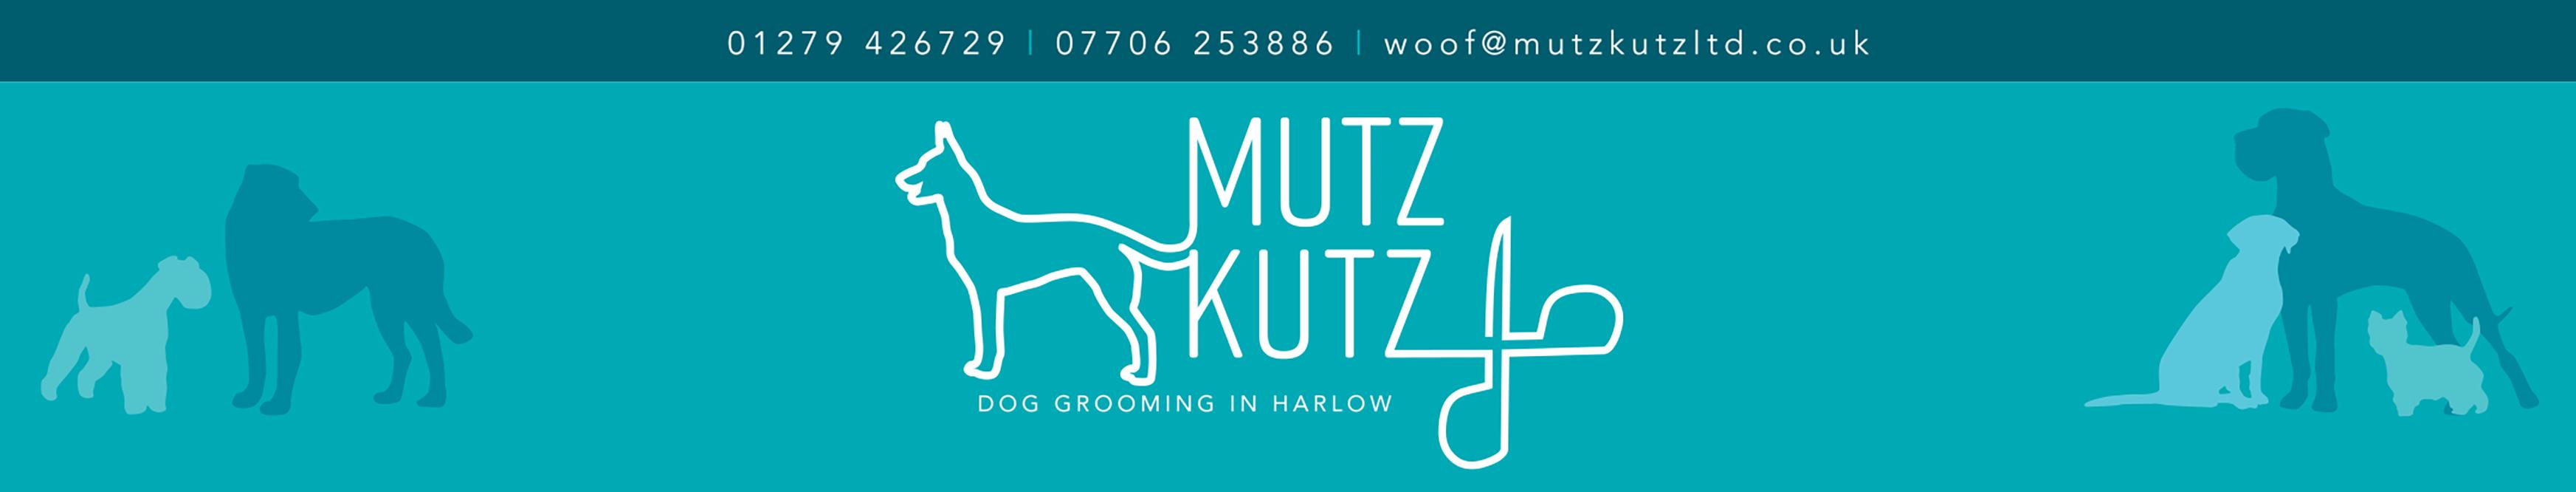 Dog Grooming Harlow